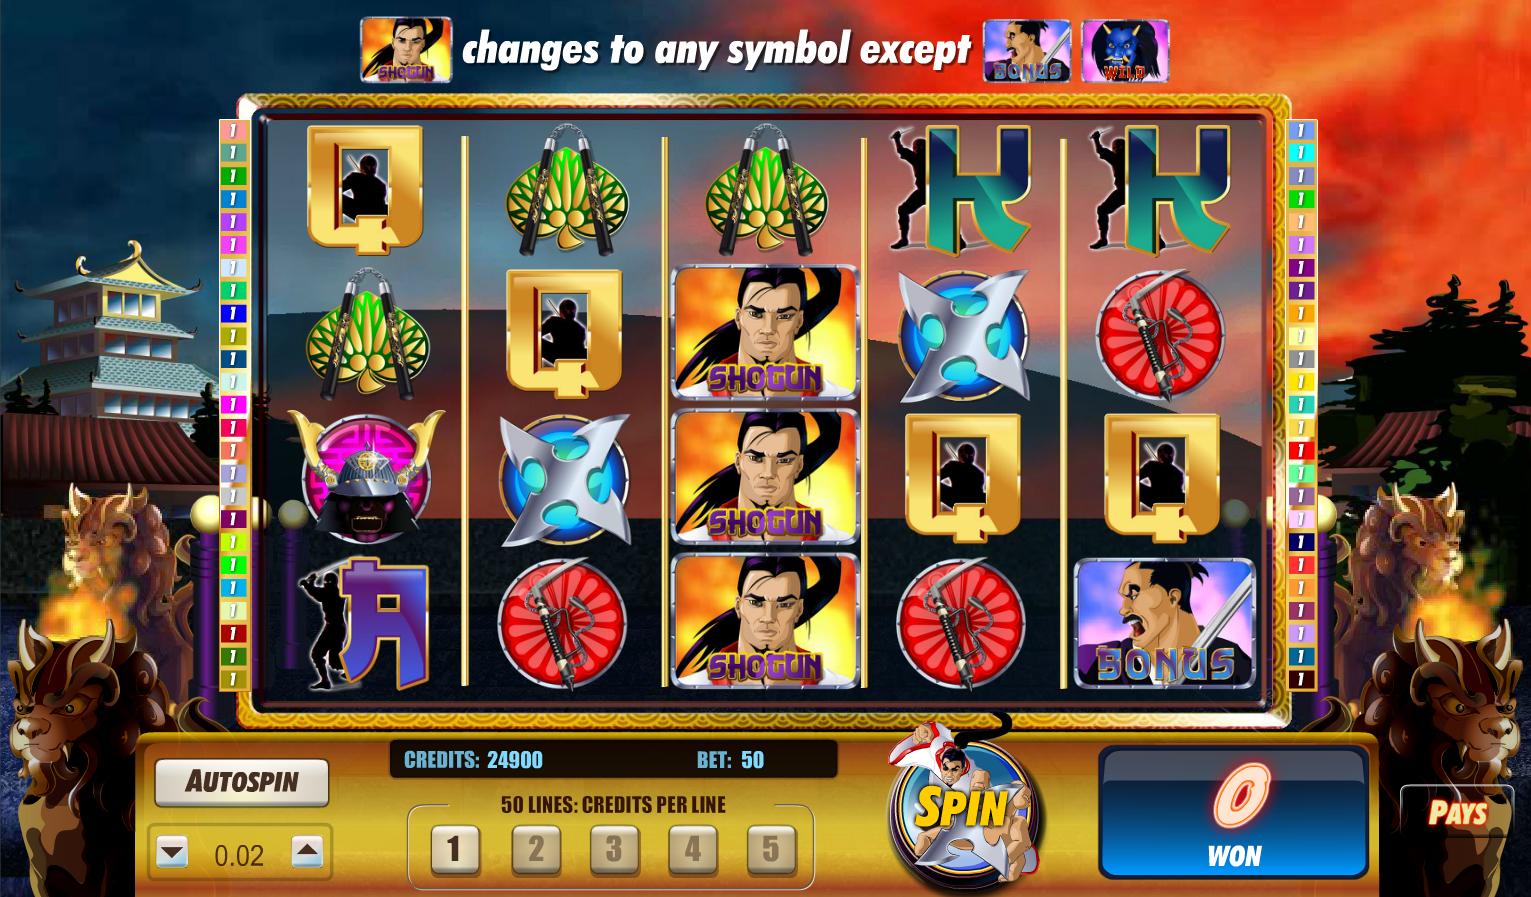 Win spins casino